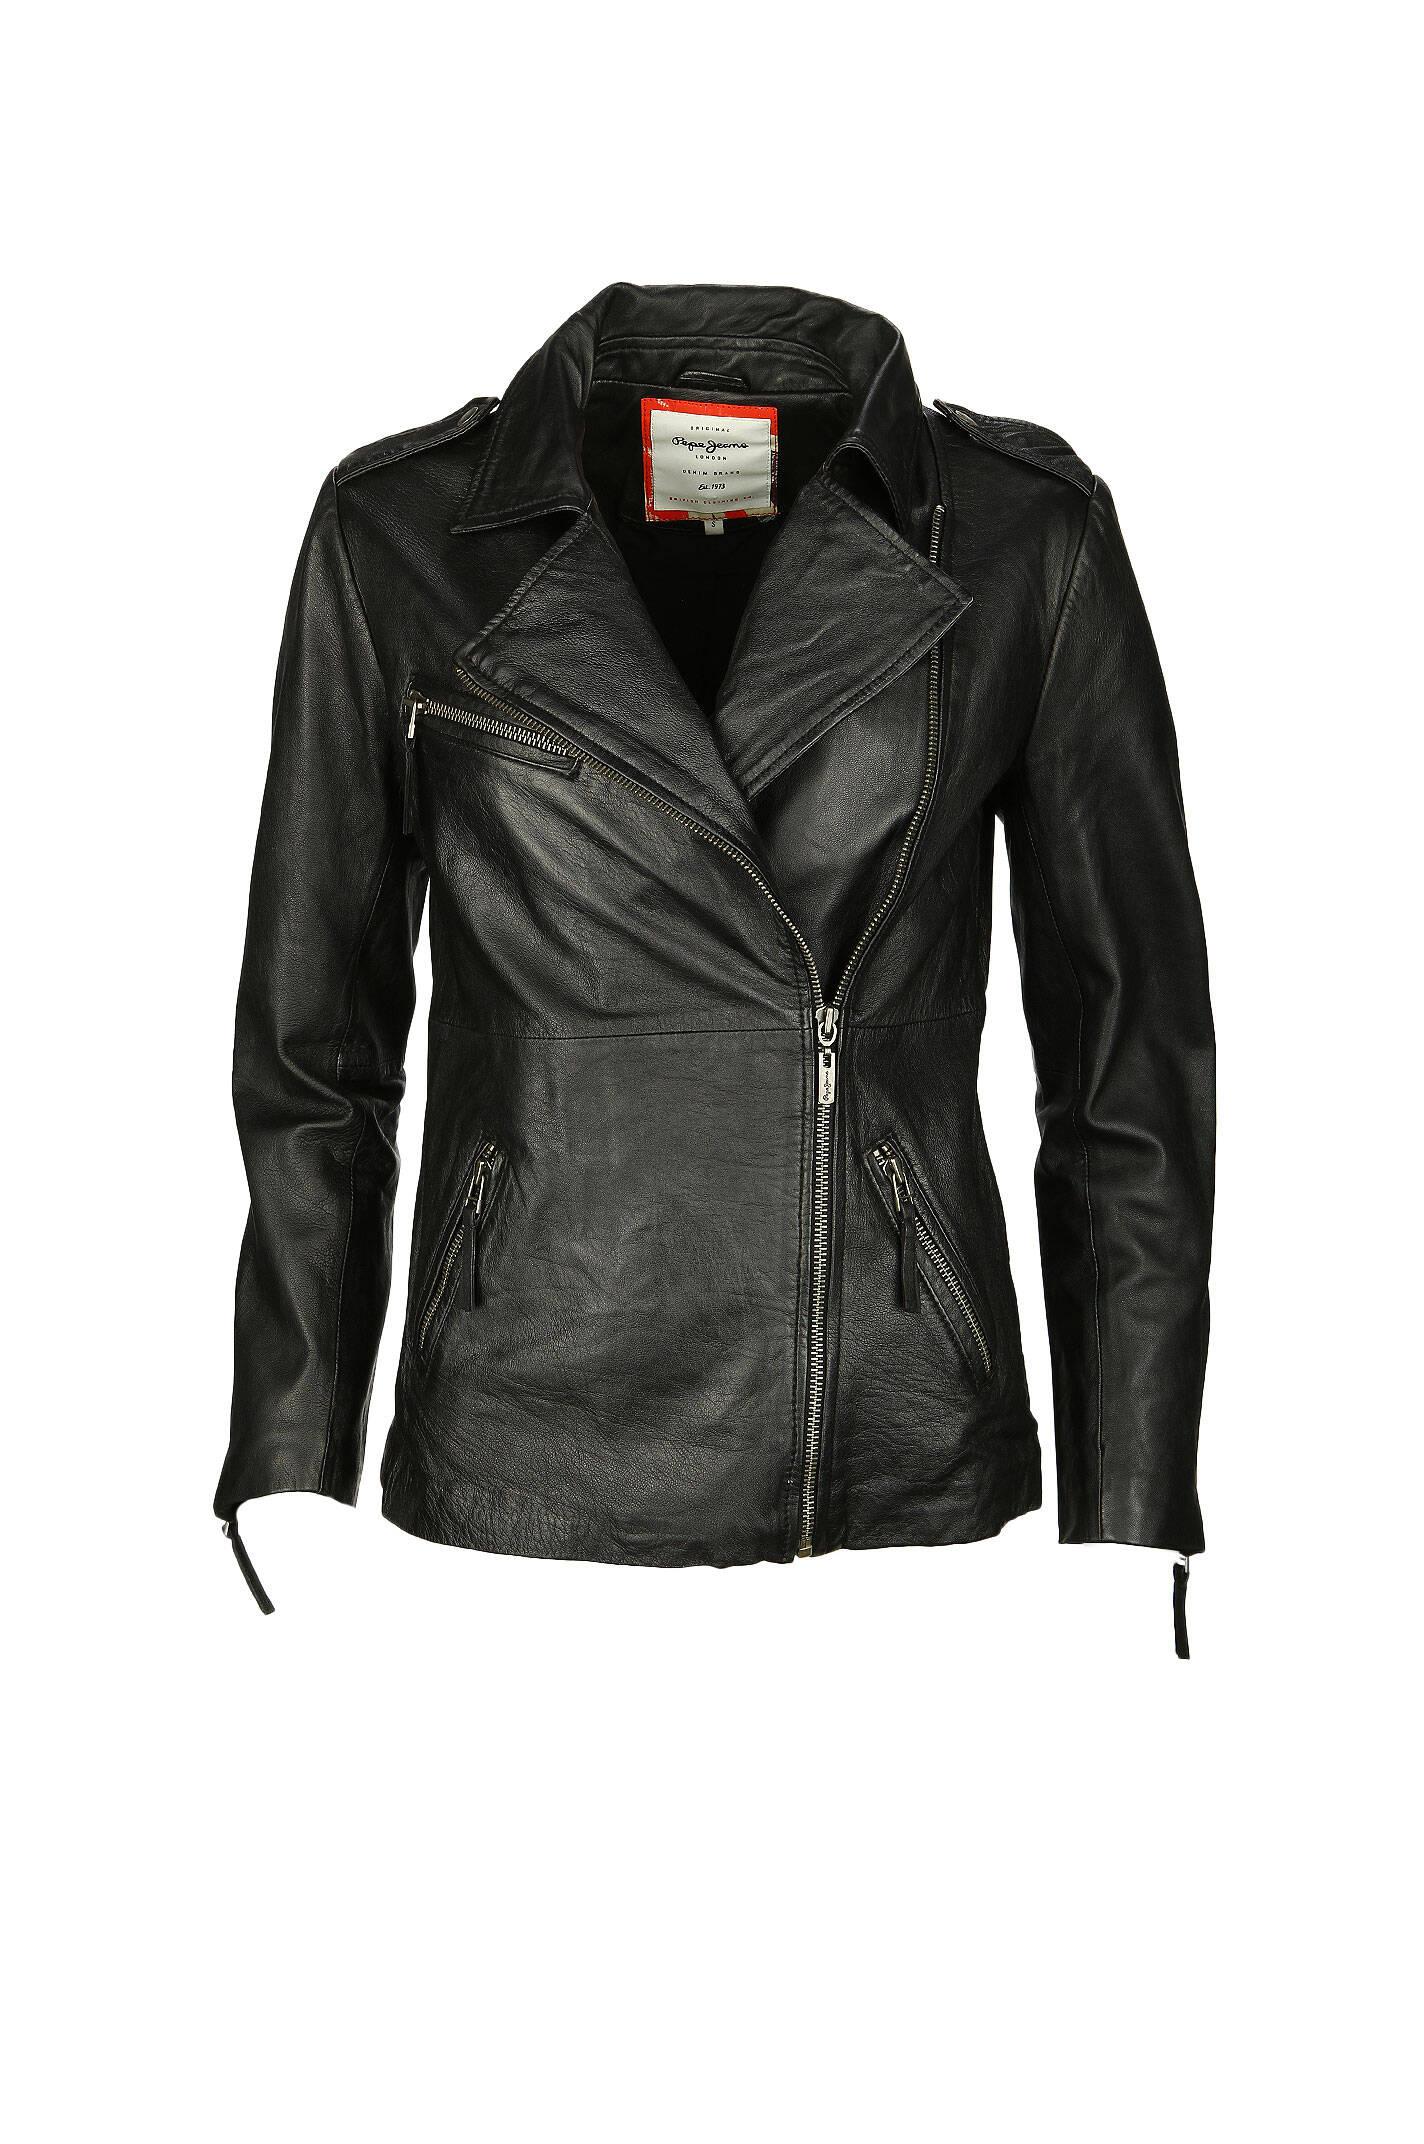 London plen Black Jeans Jacket Gomez Pepe Wella qnBaHzwTxt